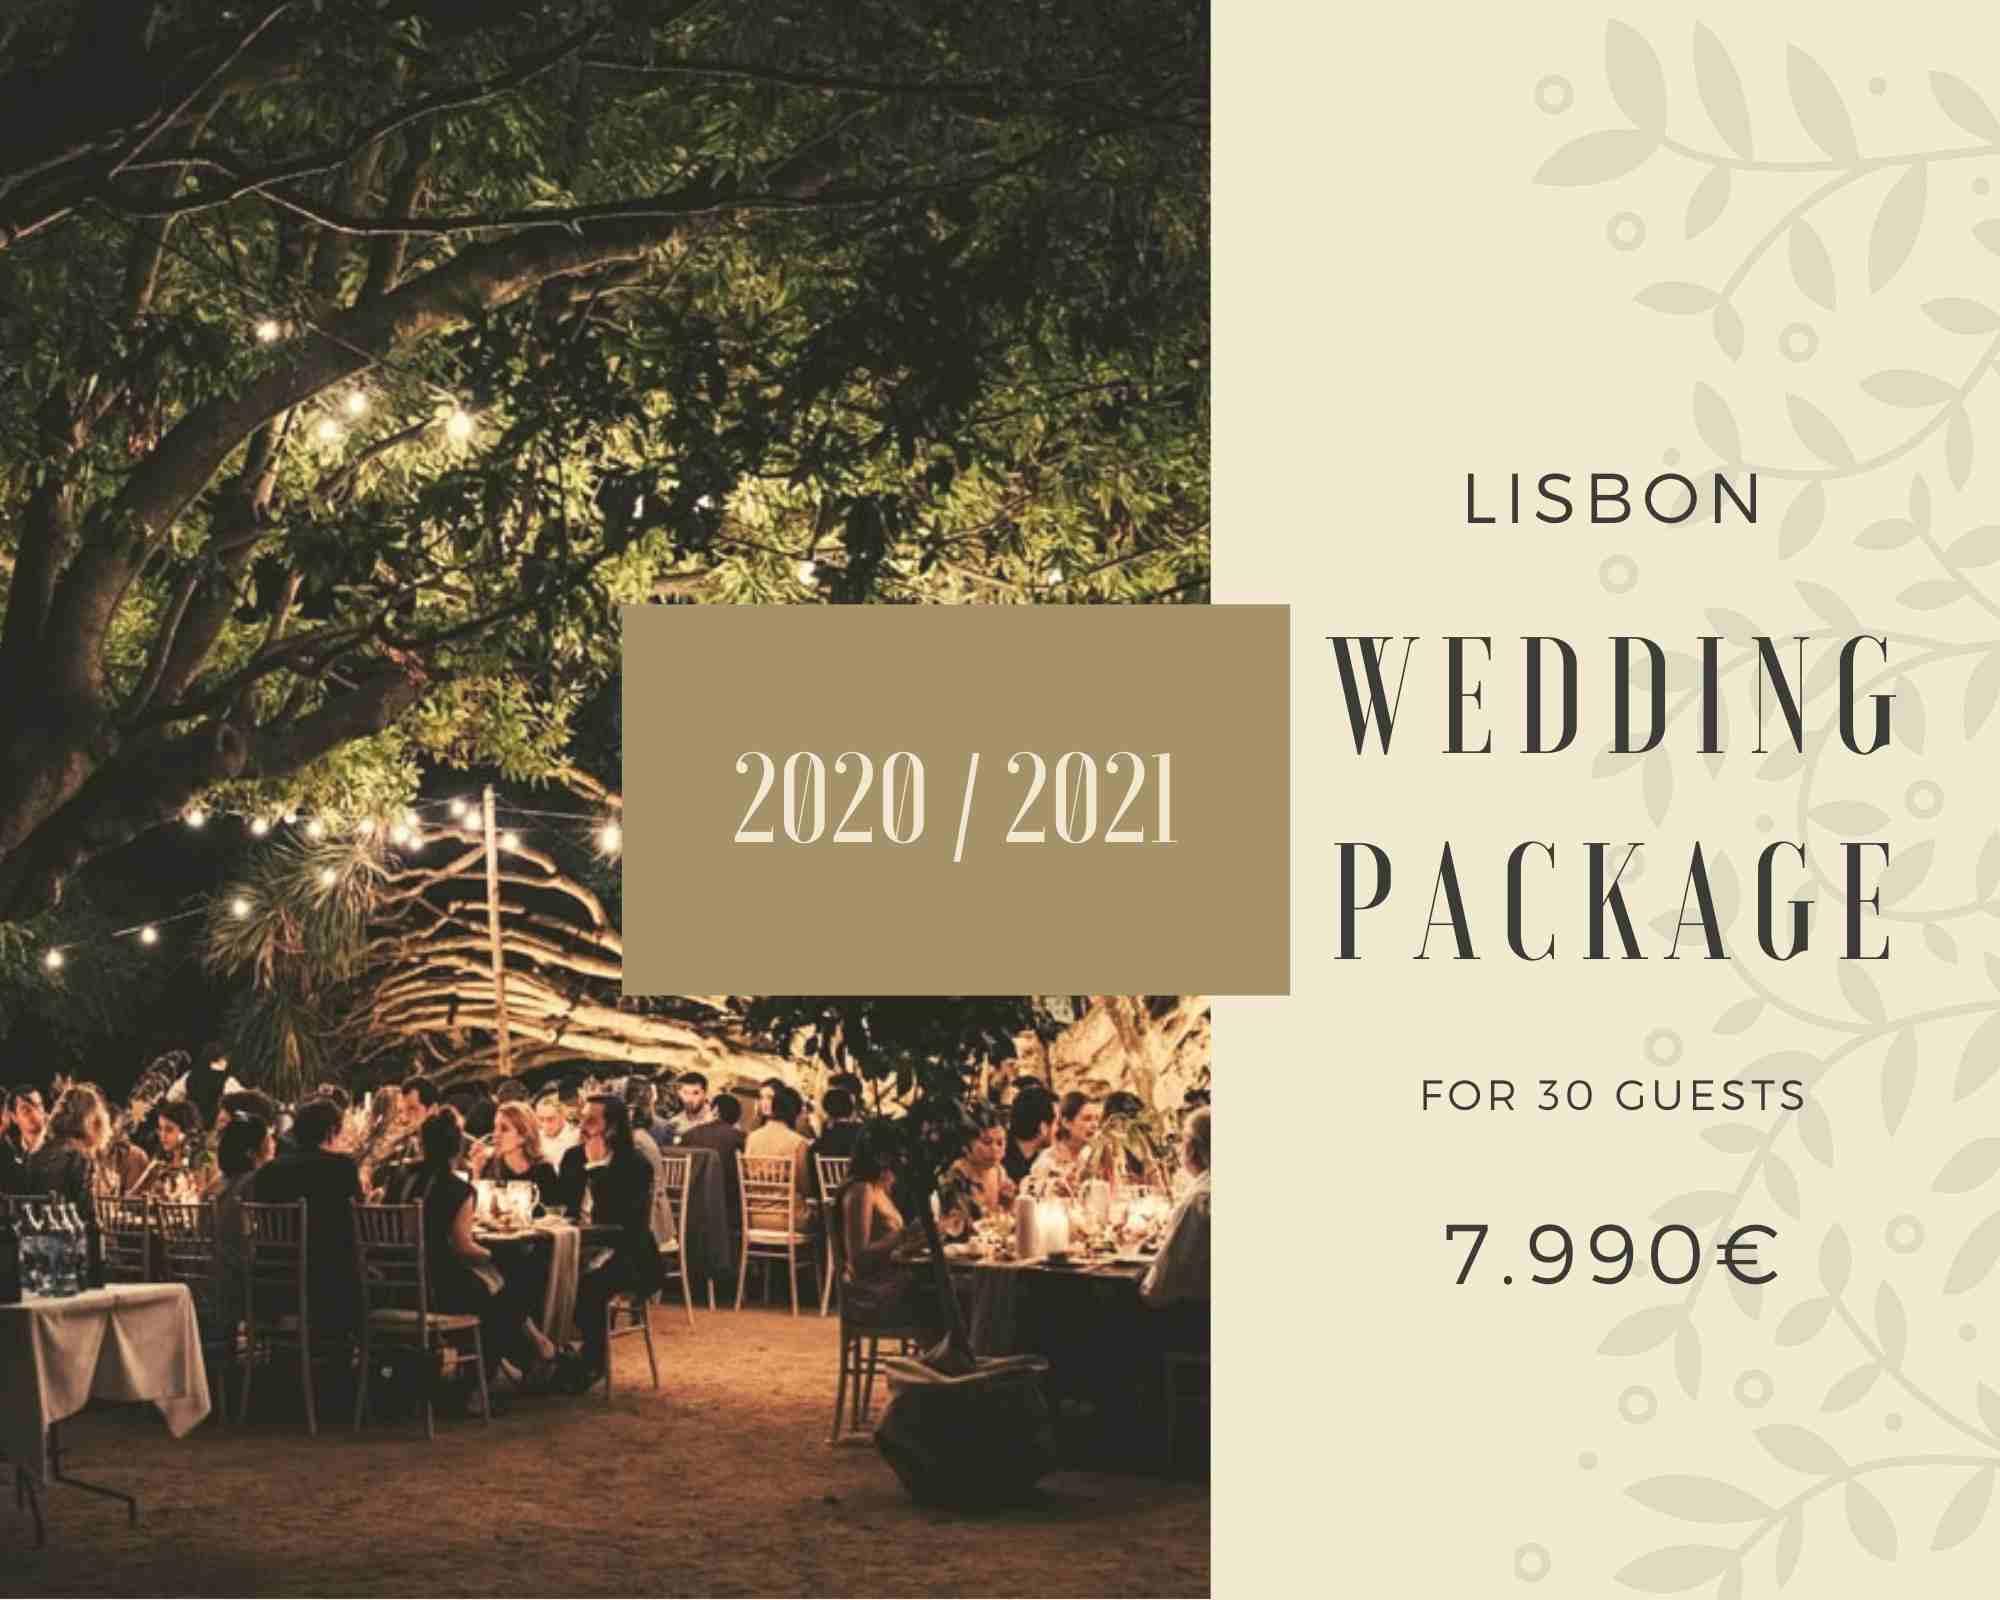 Lisbon Wedding Package 2021